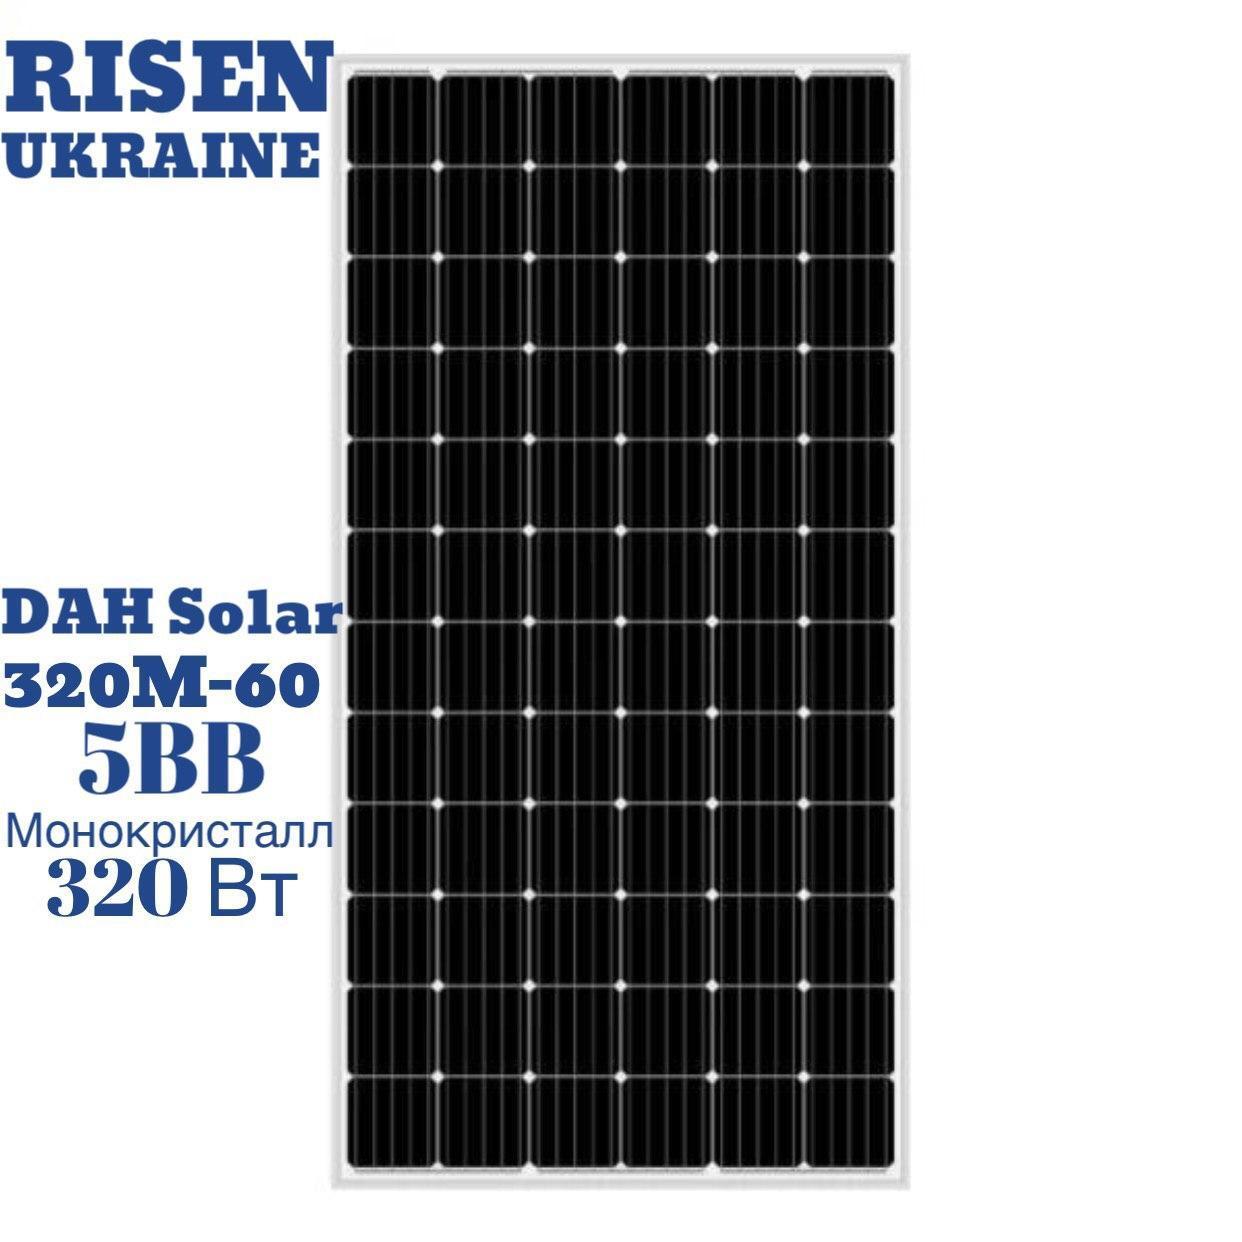 Солнечная батарея DAH Solar DHM60X, 320 Вт, 5 ВВ, 60 CELL